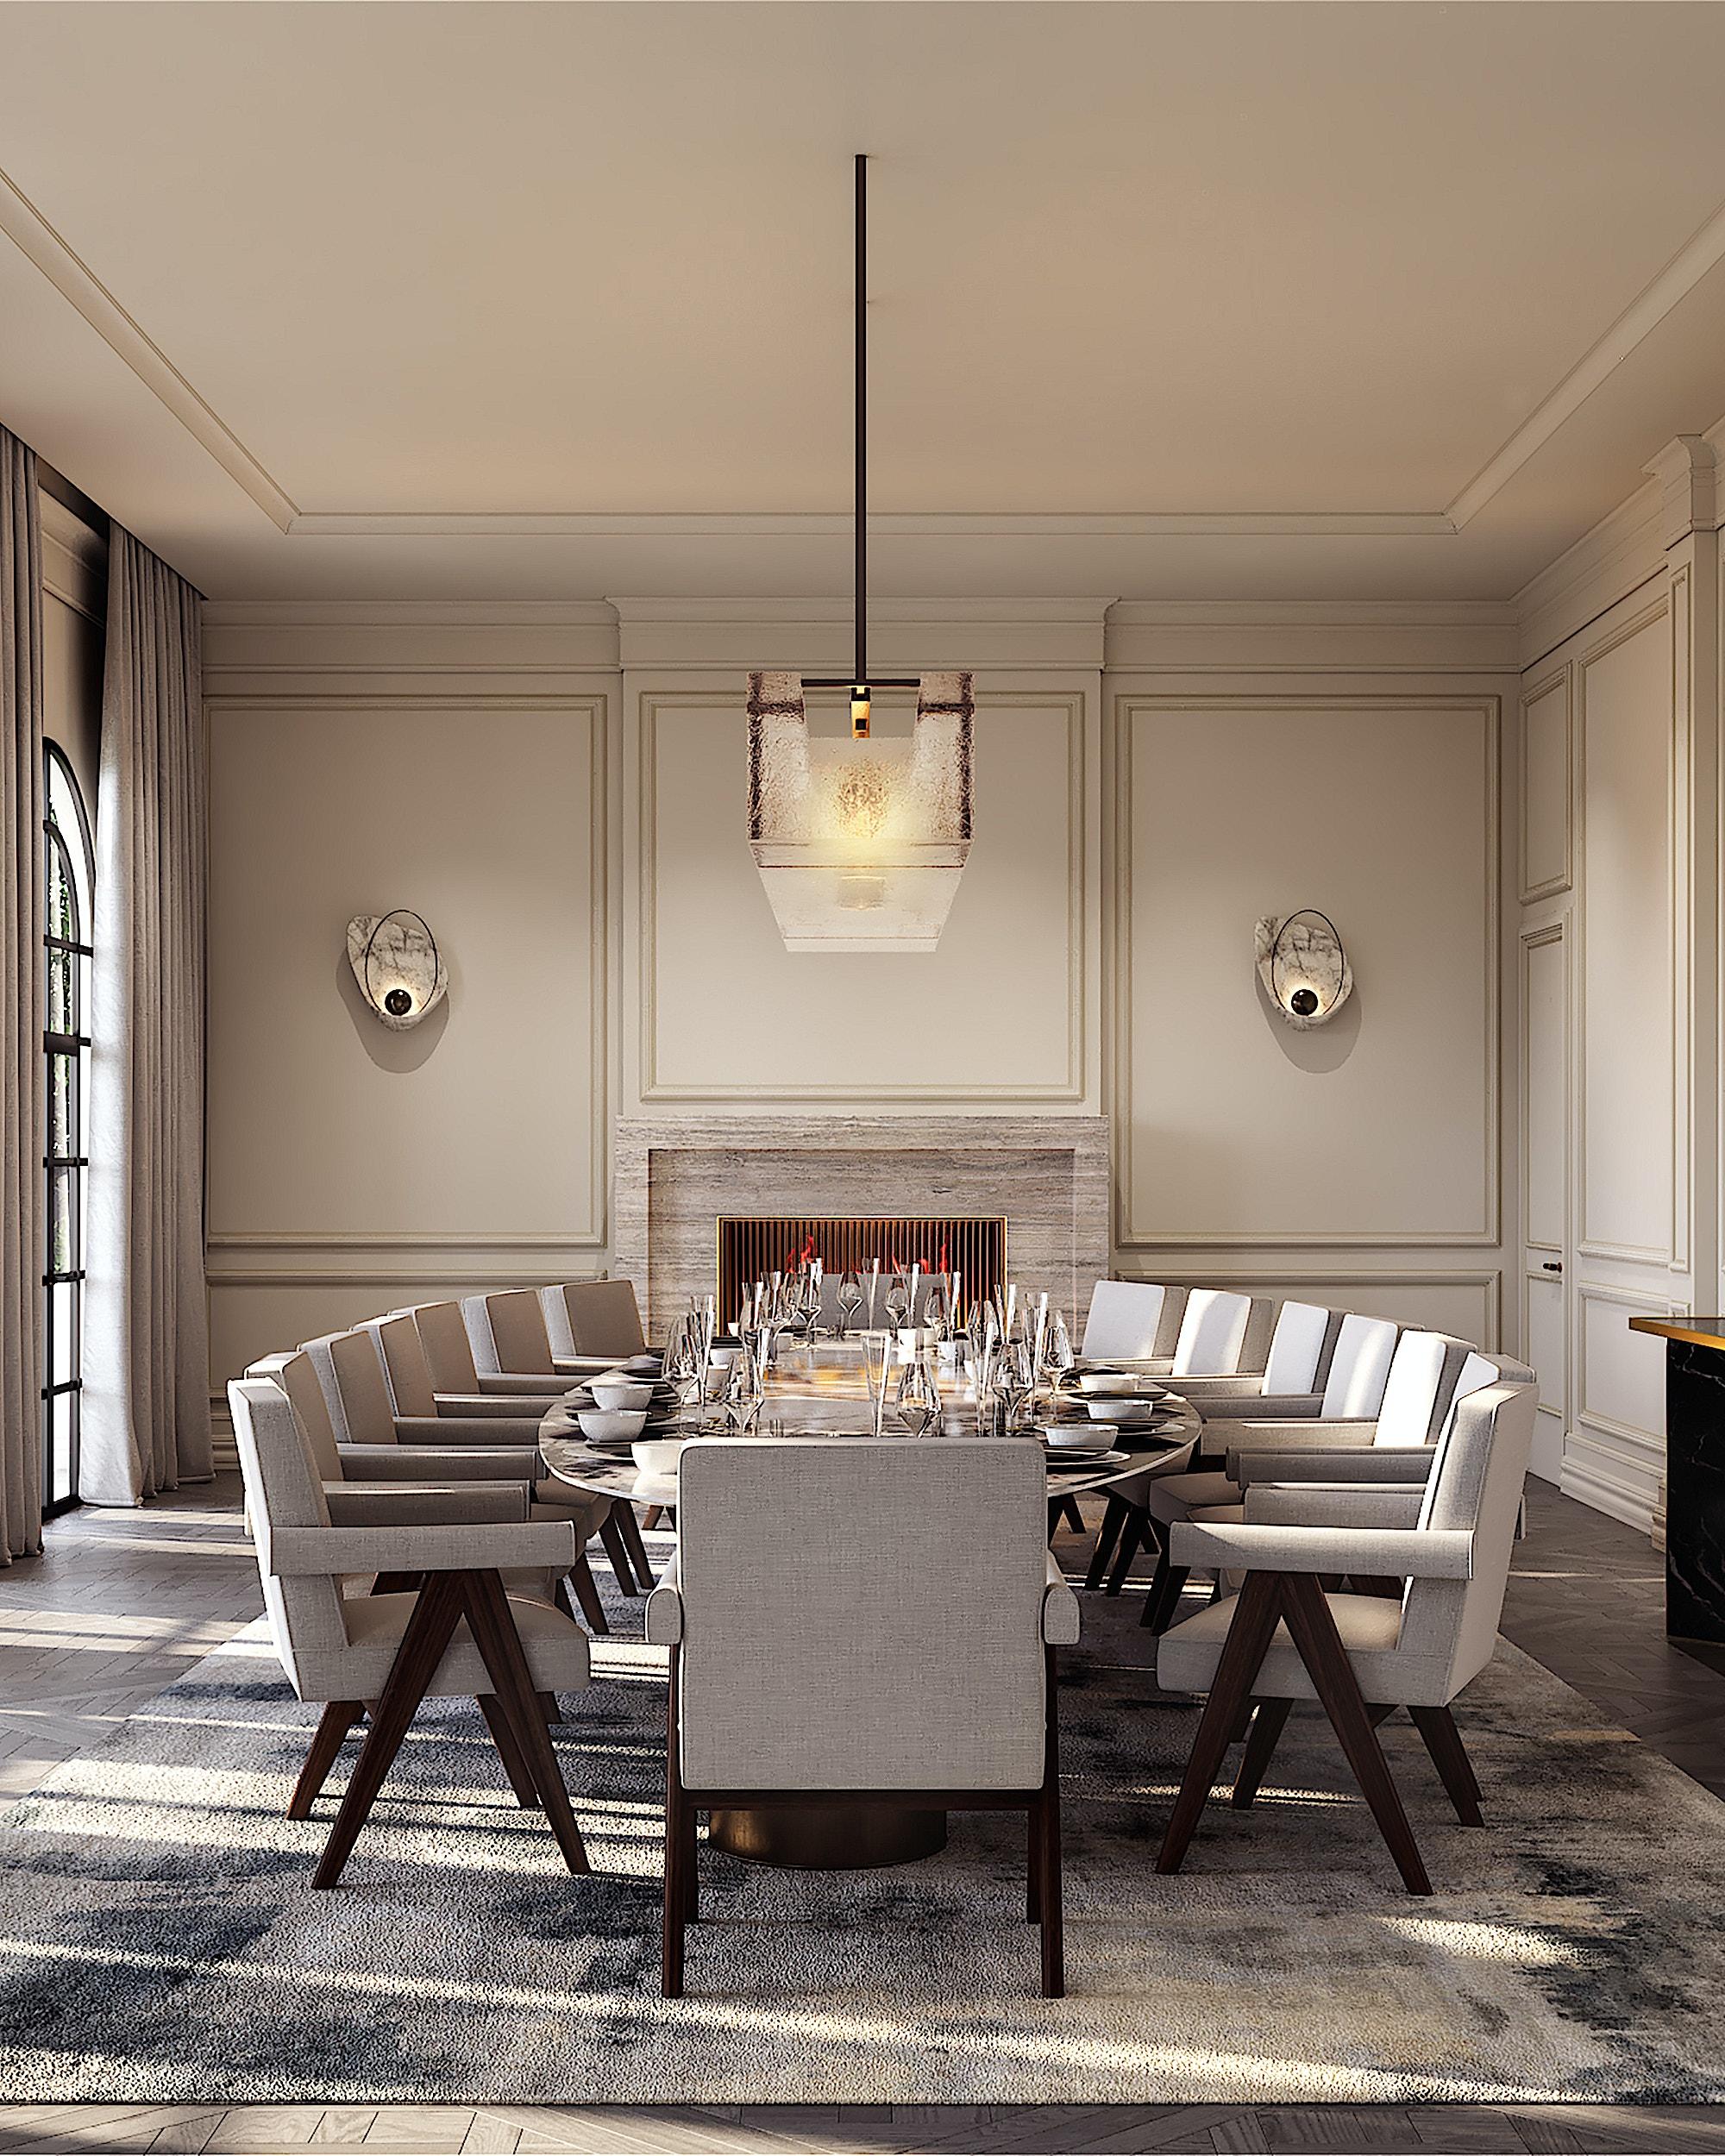 181022 Dining Roomweb